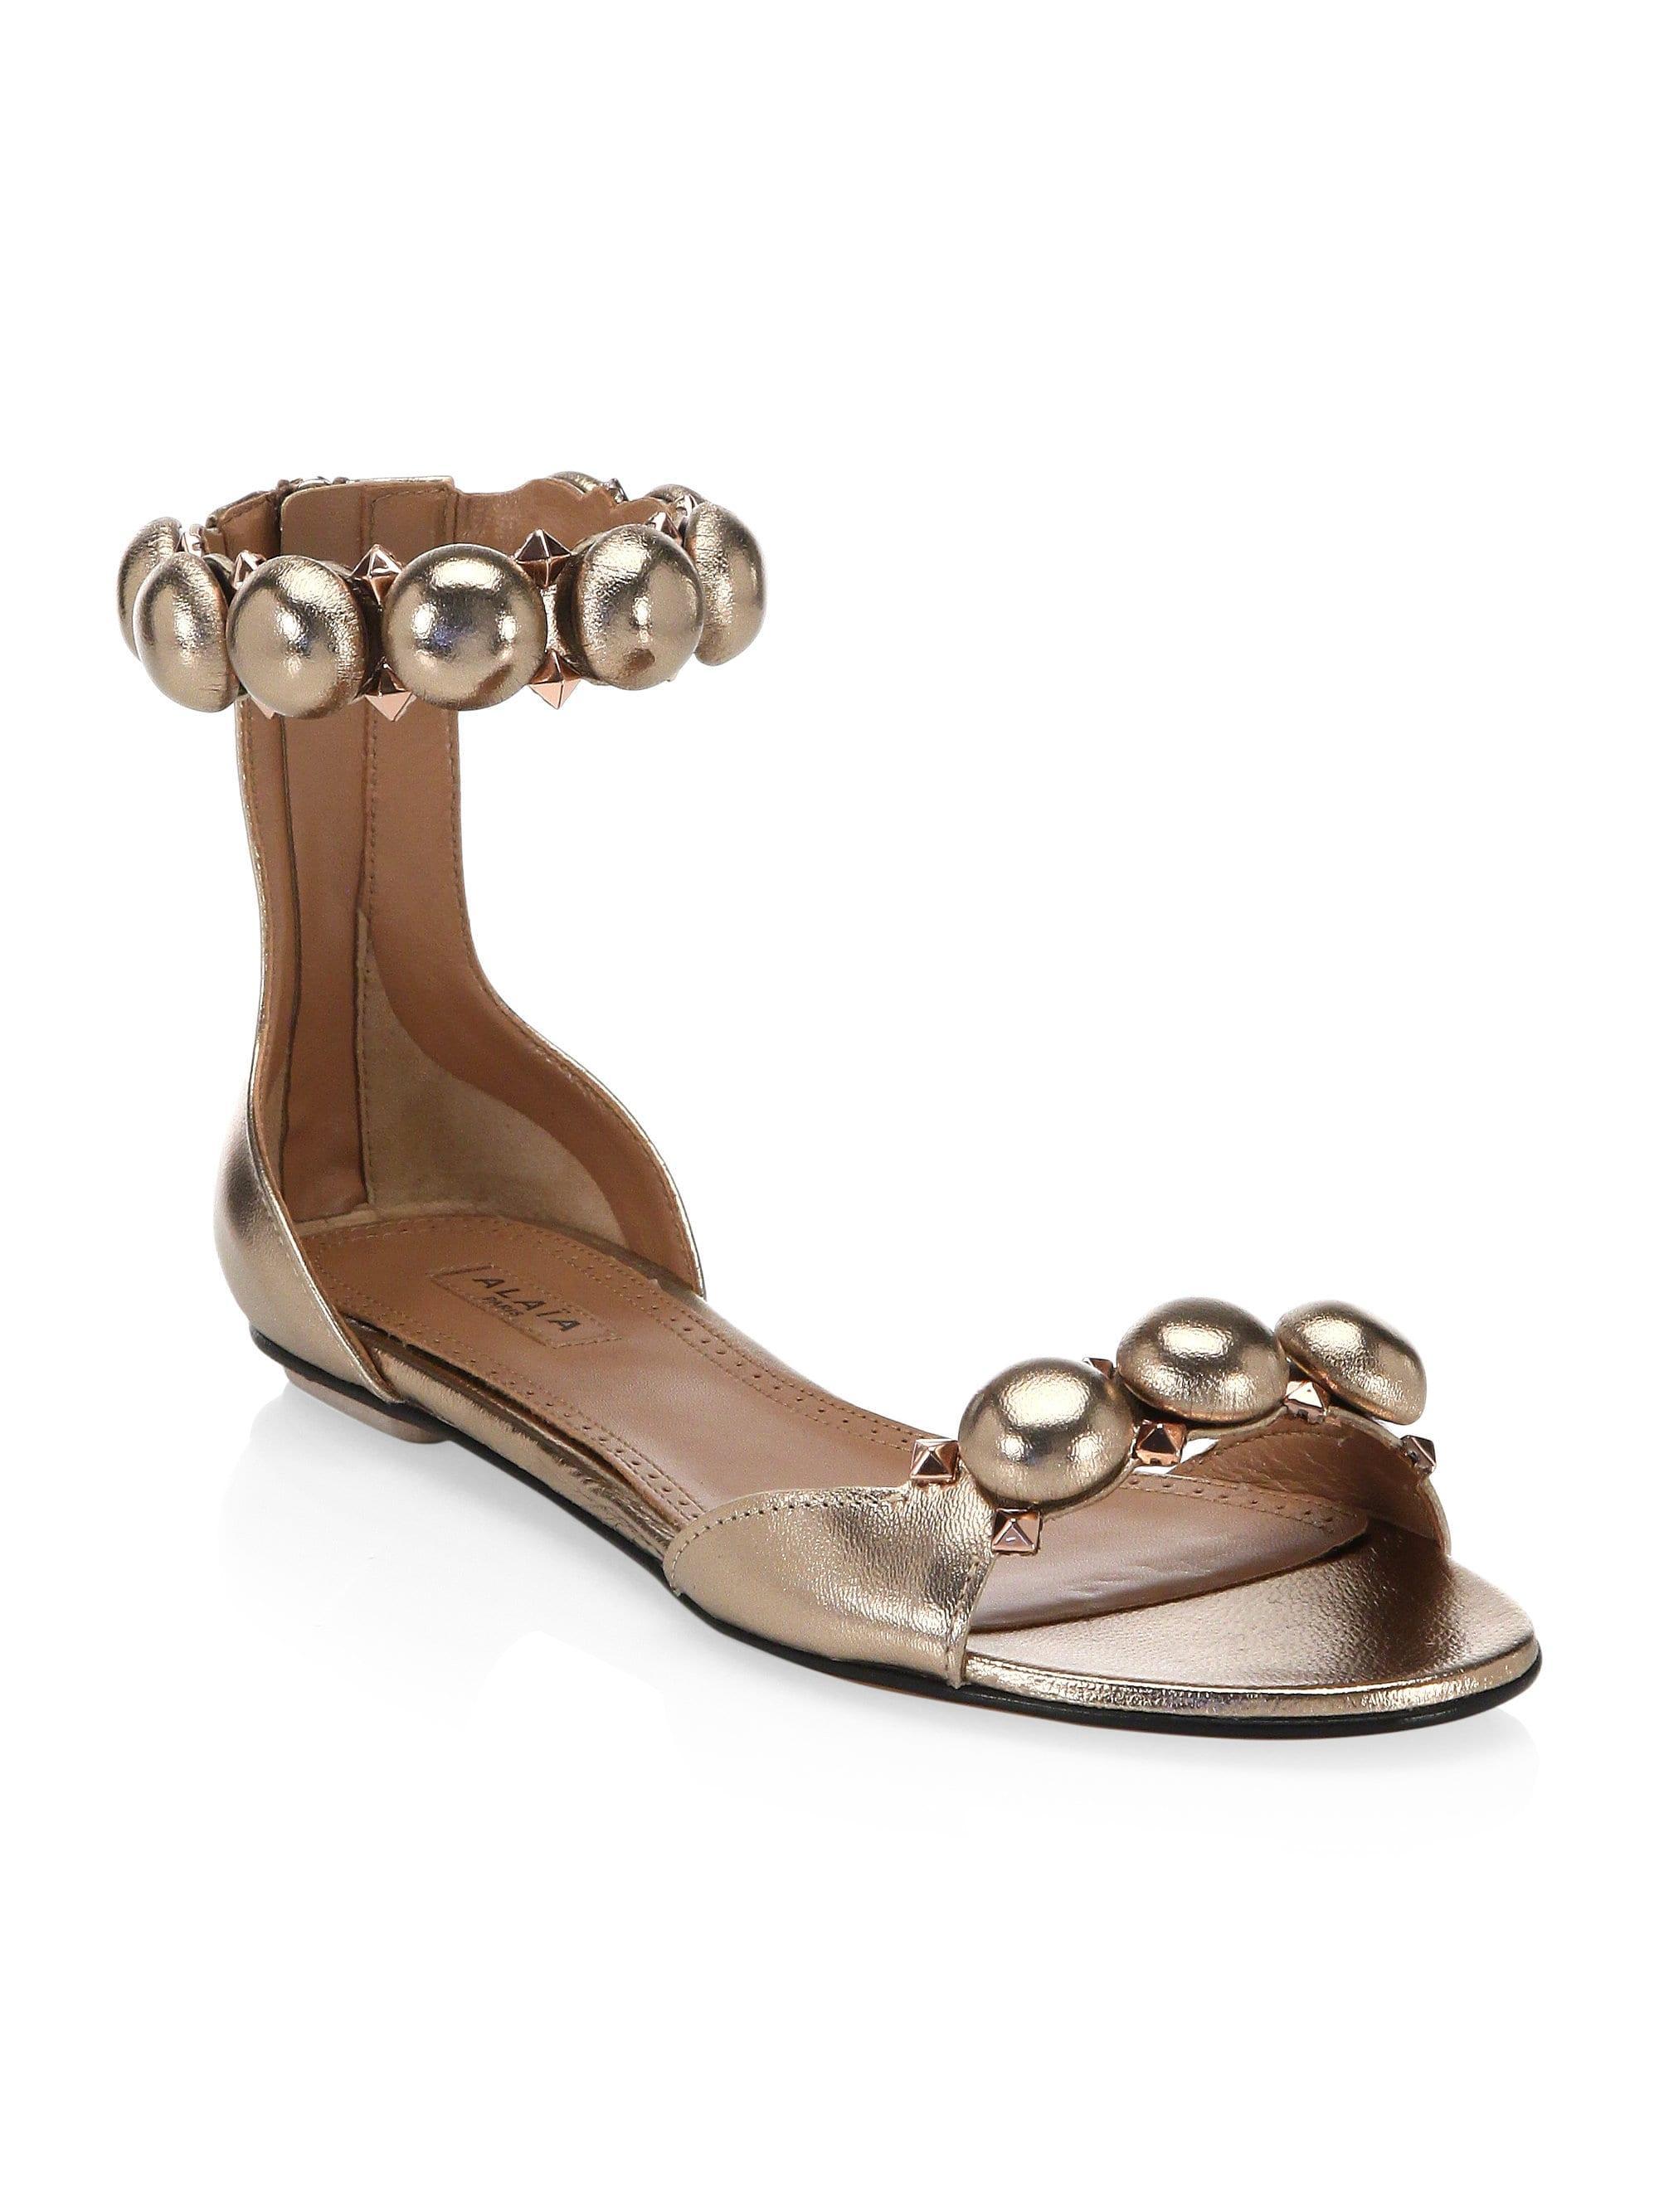 188a4f246bfcb Alaïa Studded Leather Sandals in Metallic - Lyst